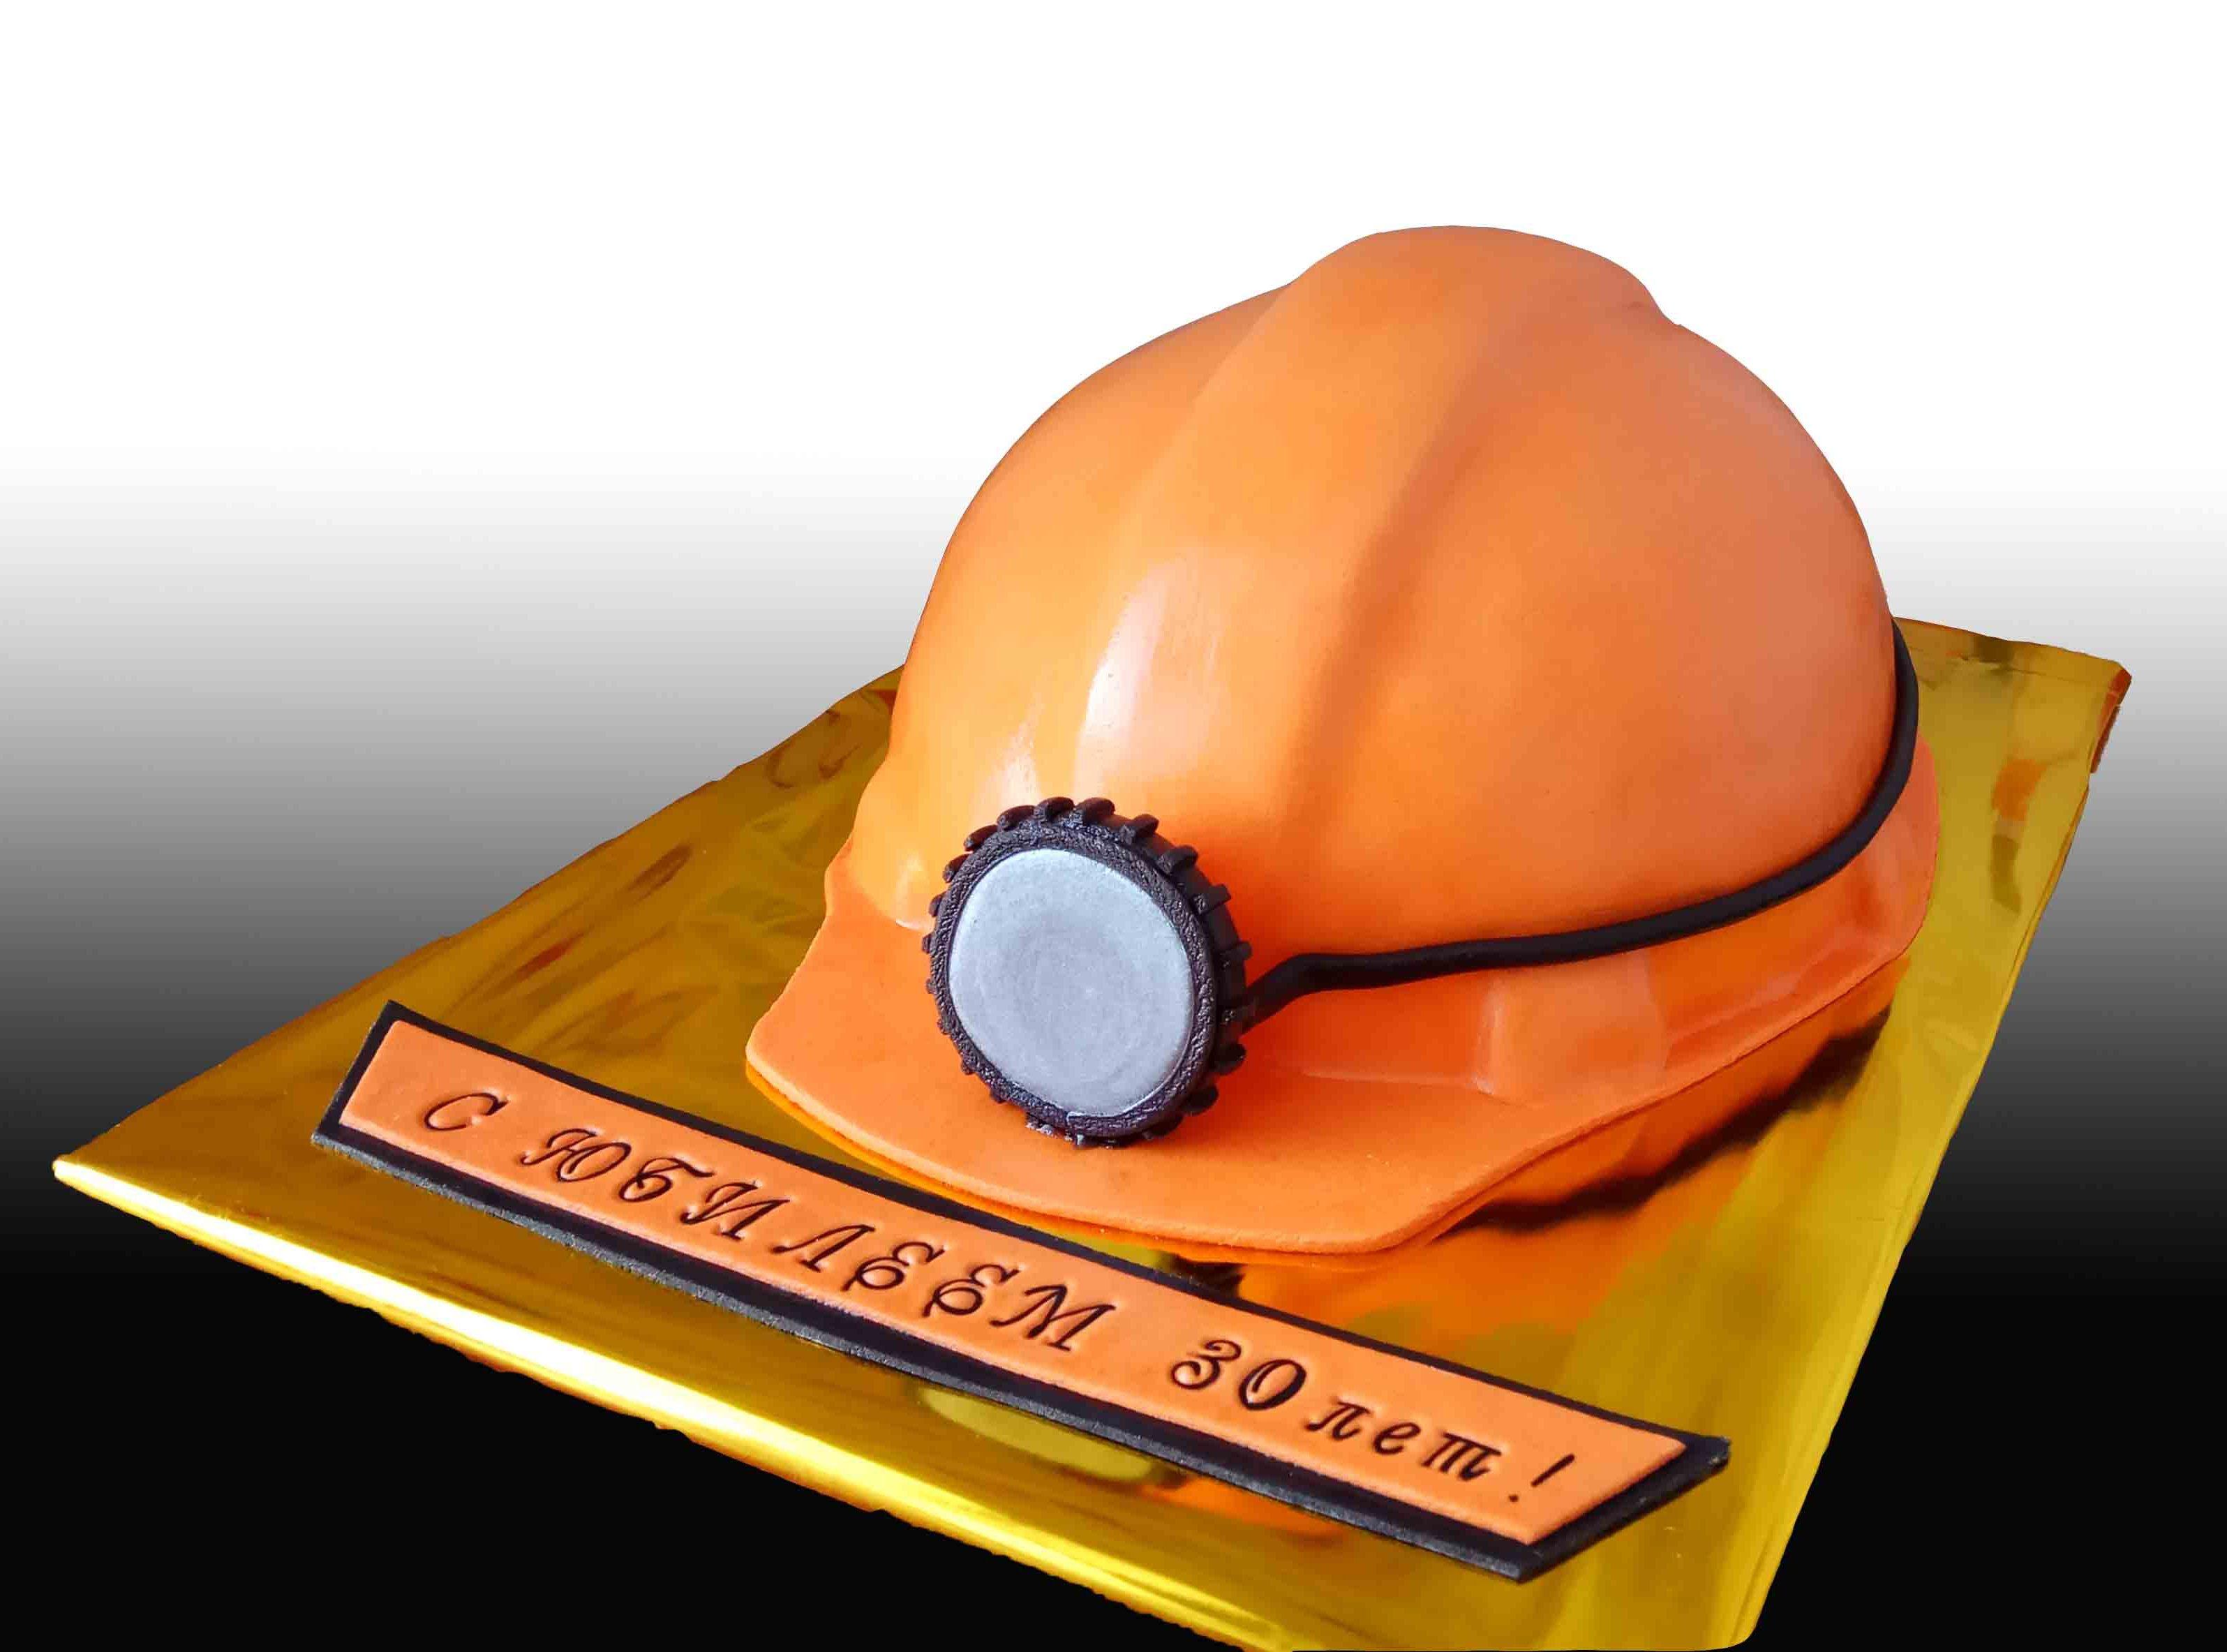 торт для шахтера из мастики фото данном сценарии взваливает